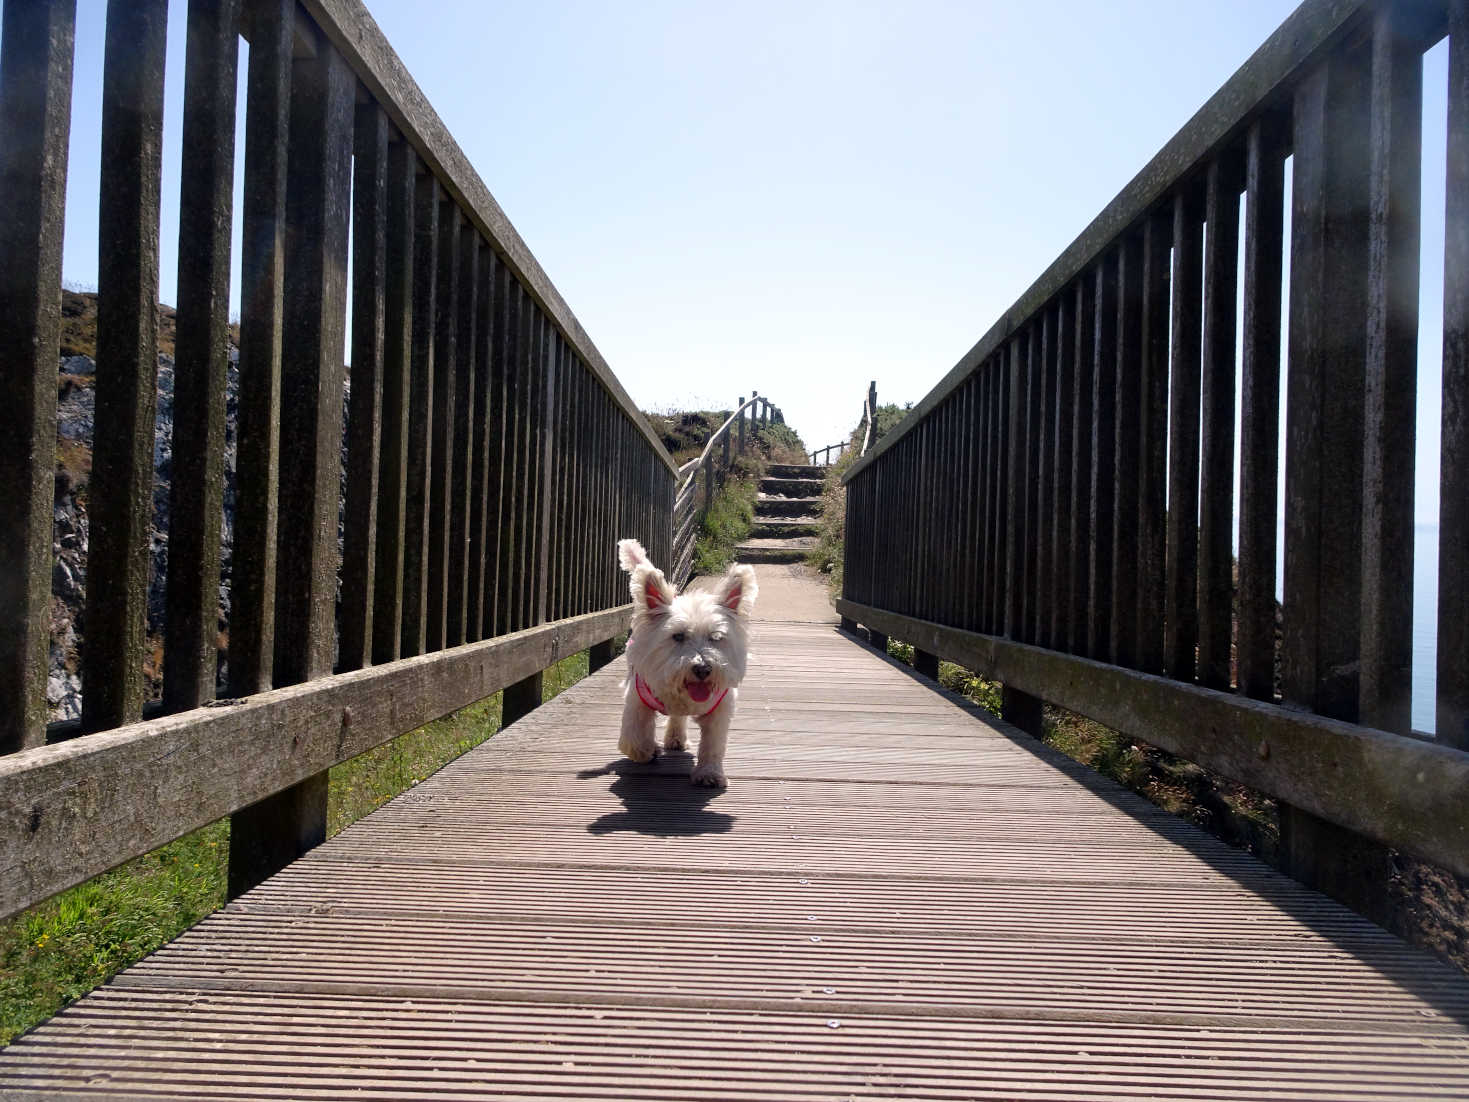 poppysocks crossing bridge at portpatrick